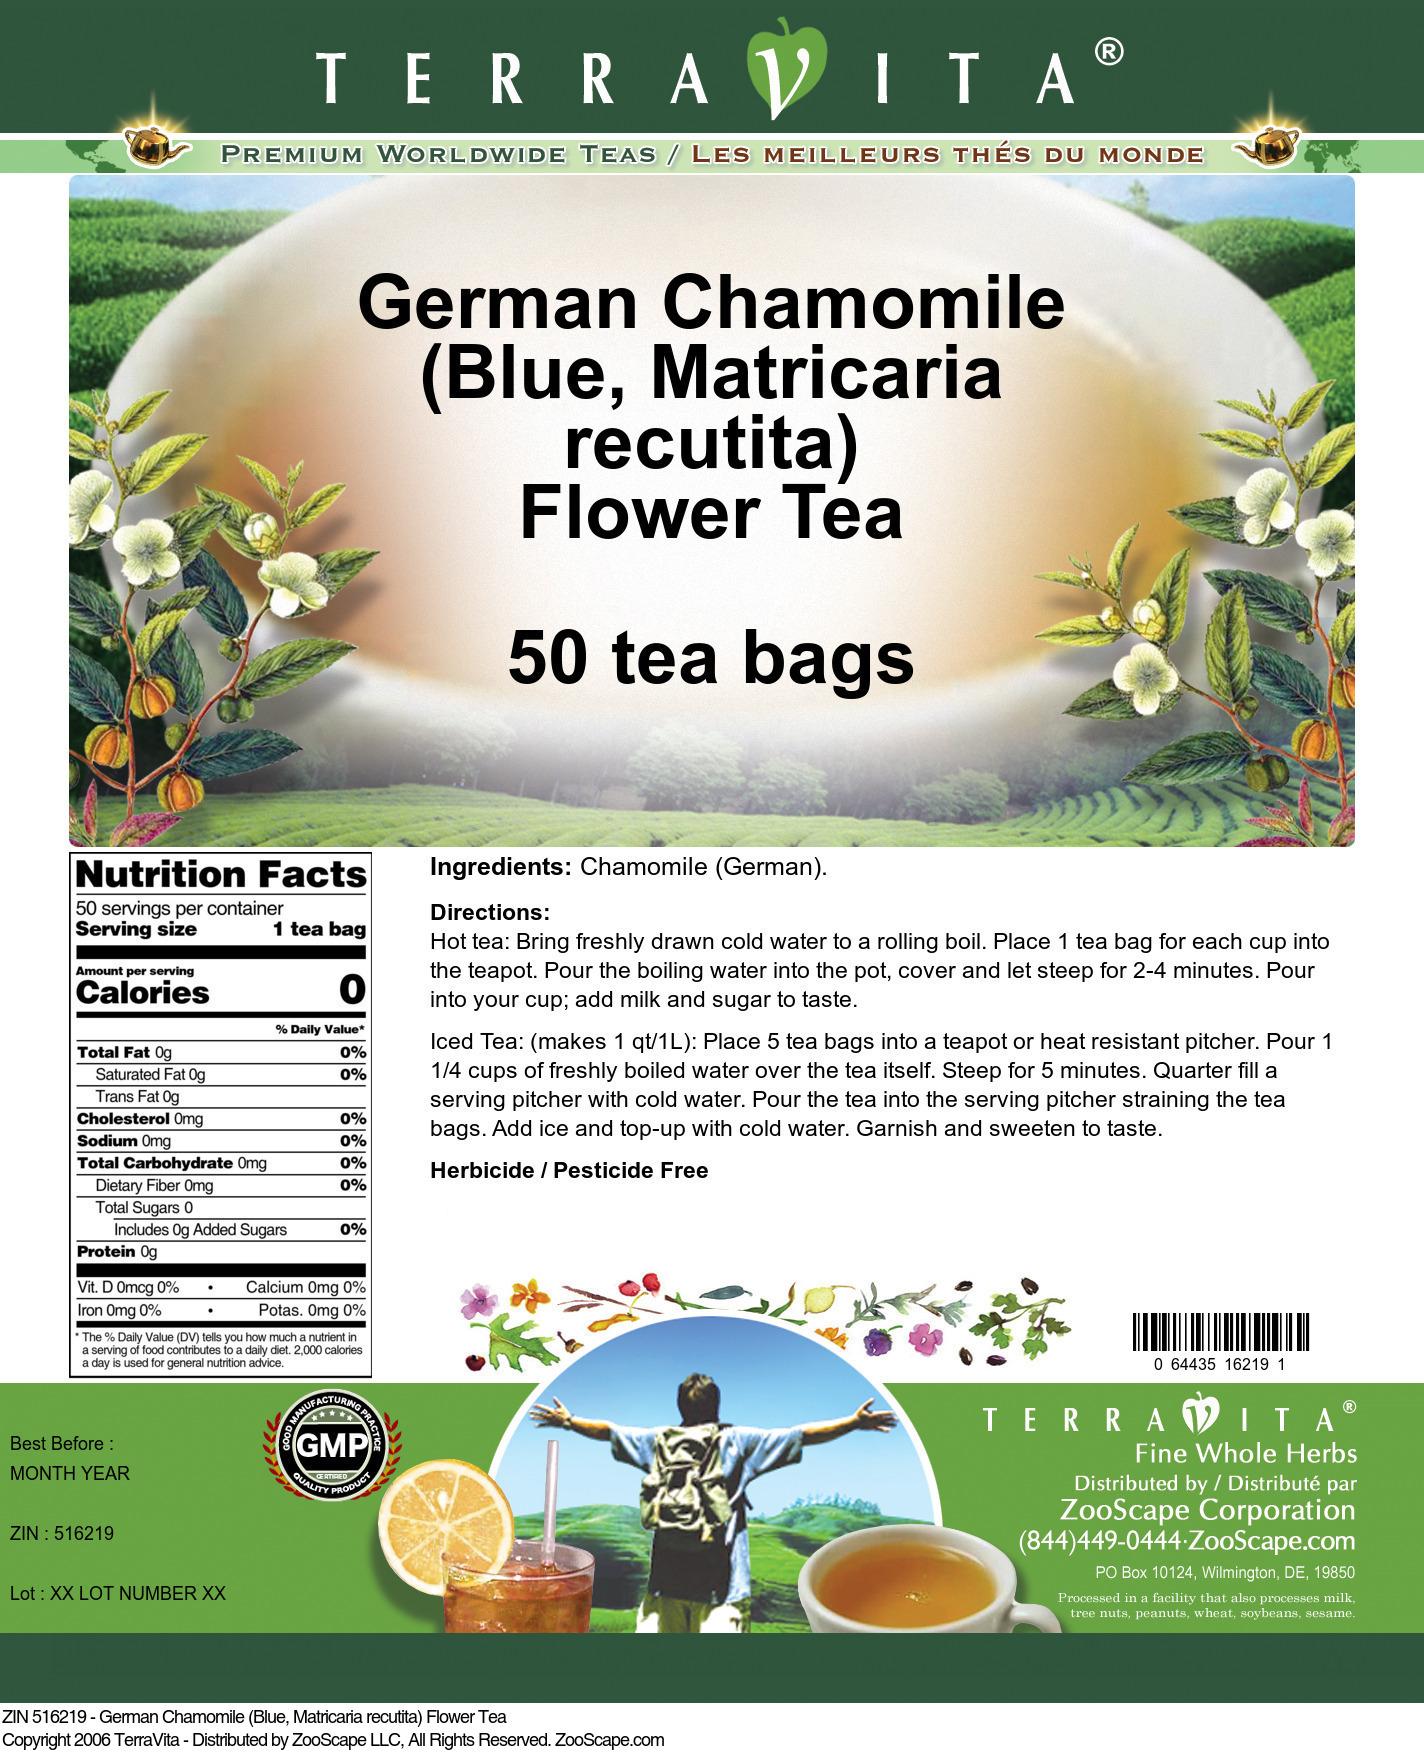 German Chamomile (Blue, Matricaria recutita) Flower Tea